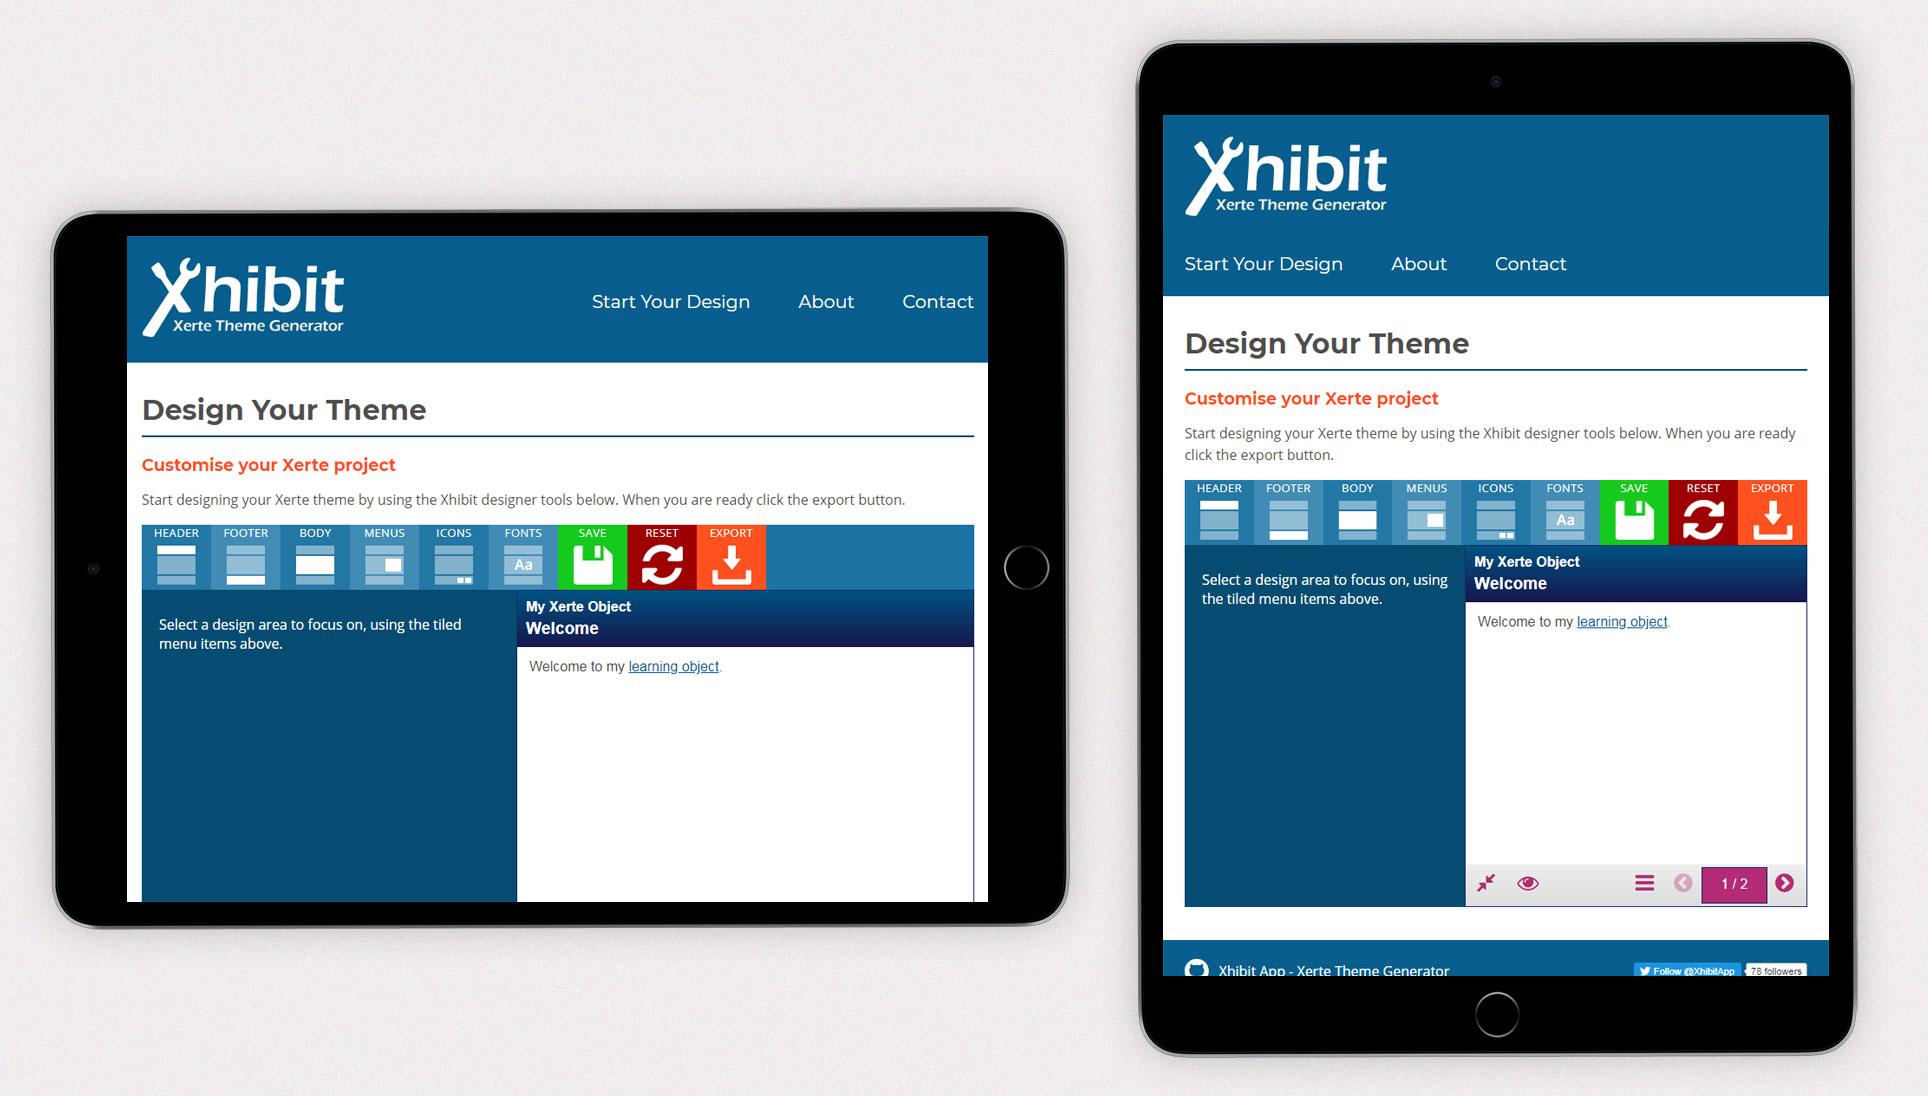 Xhibit App - iPad